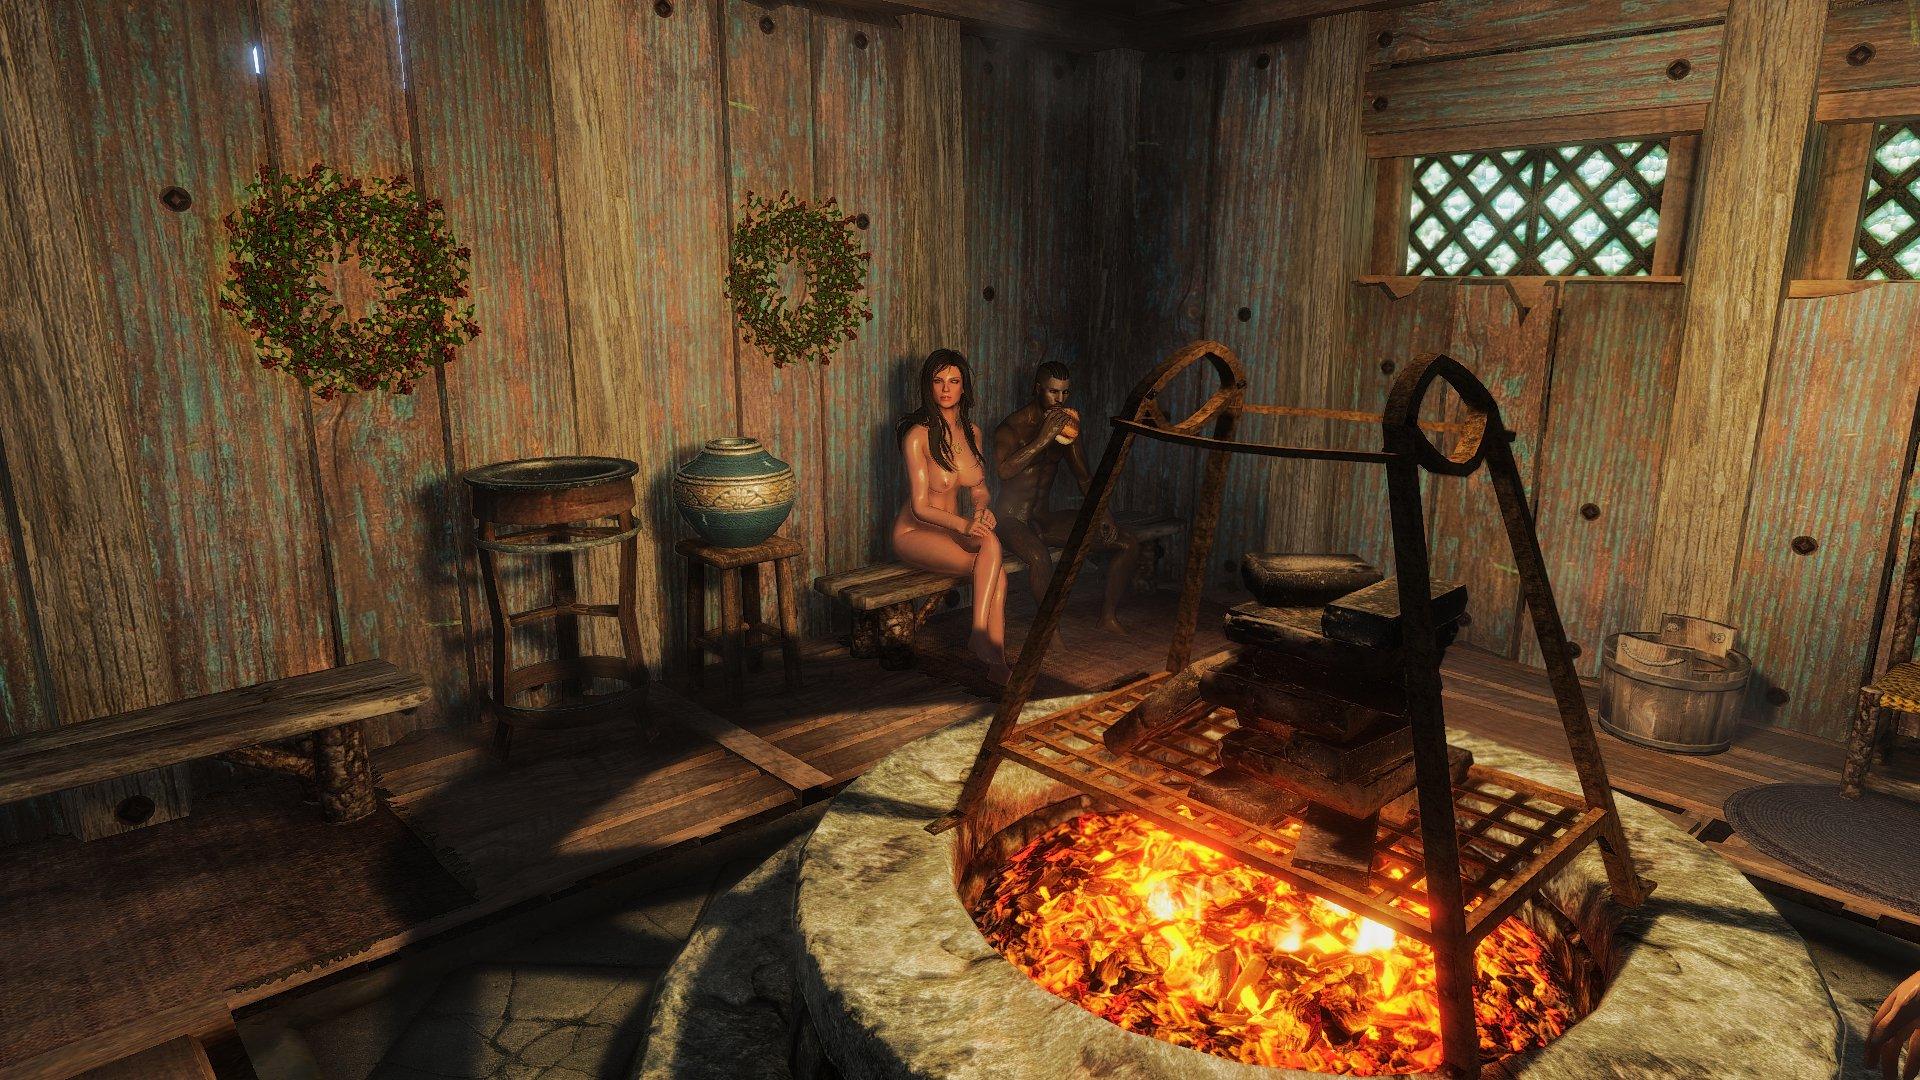 Sauna House Rus